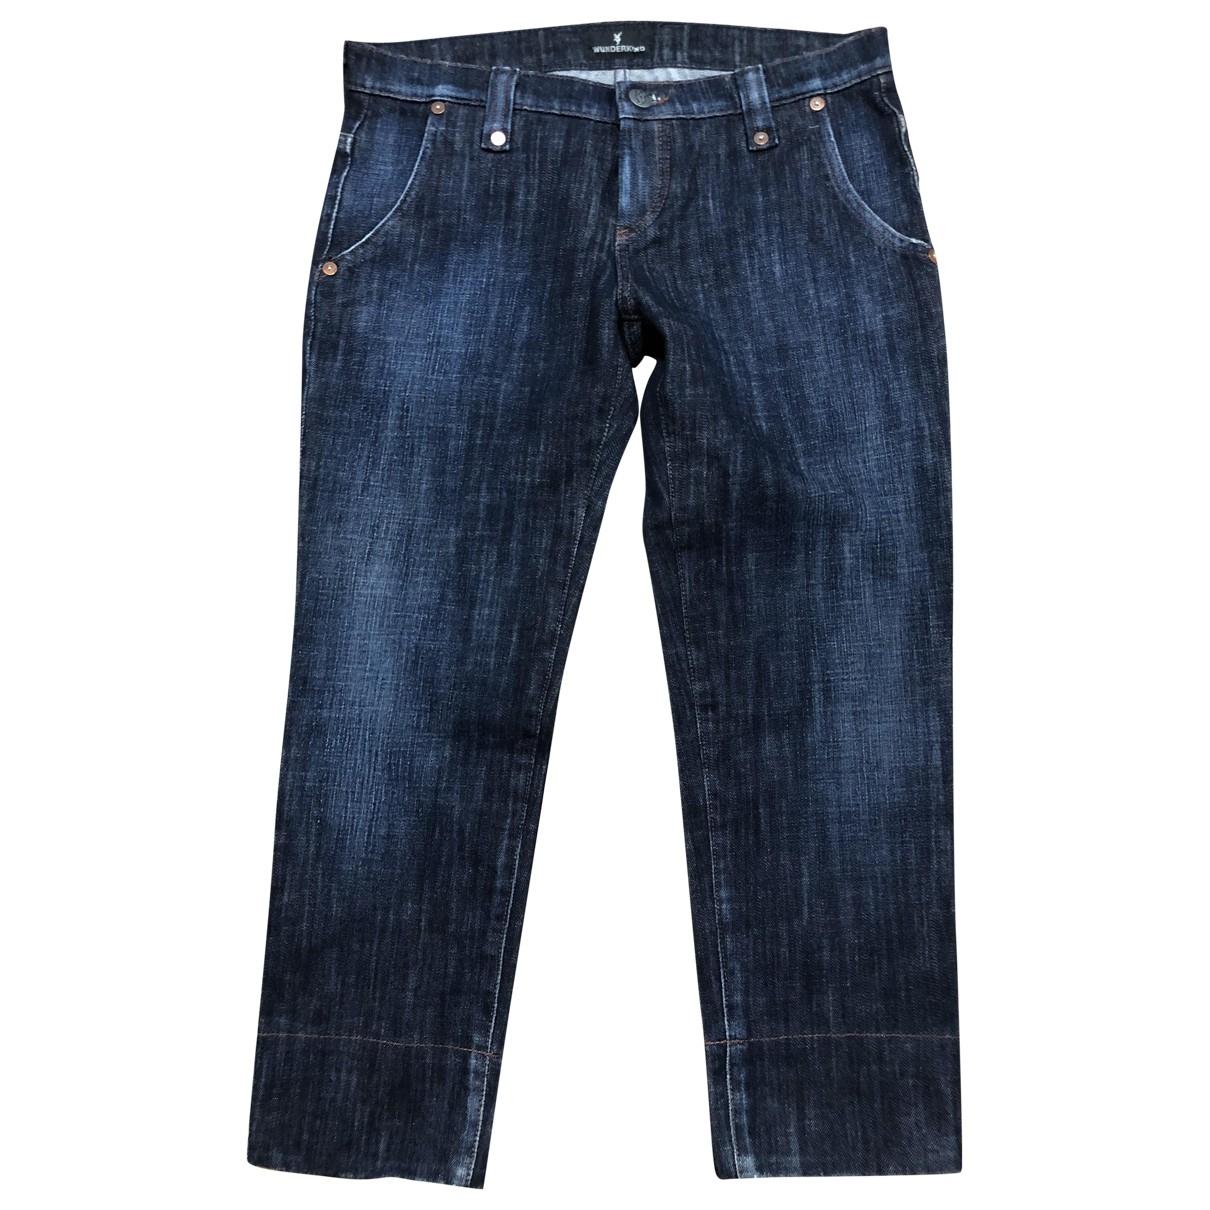 Wunderkind \N Blue Denim - Jeans Jeans for Women 36 FR